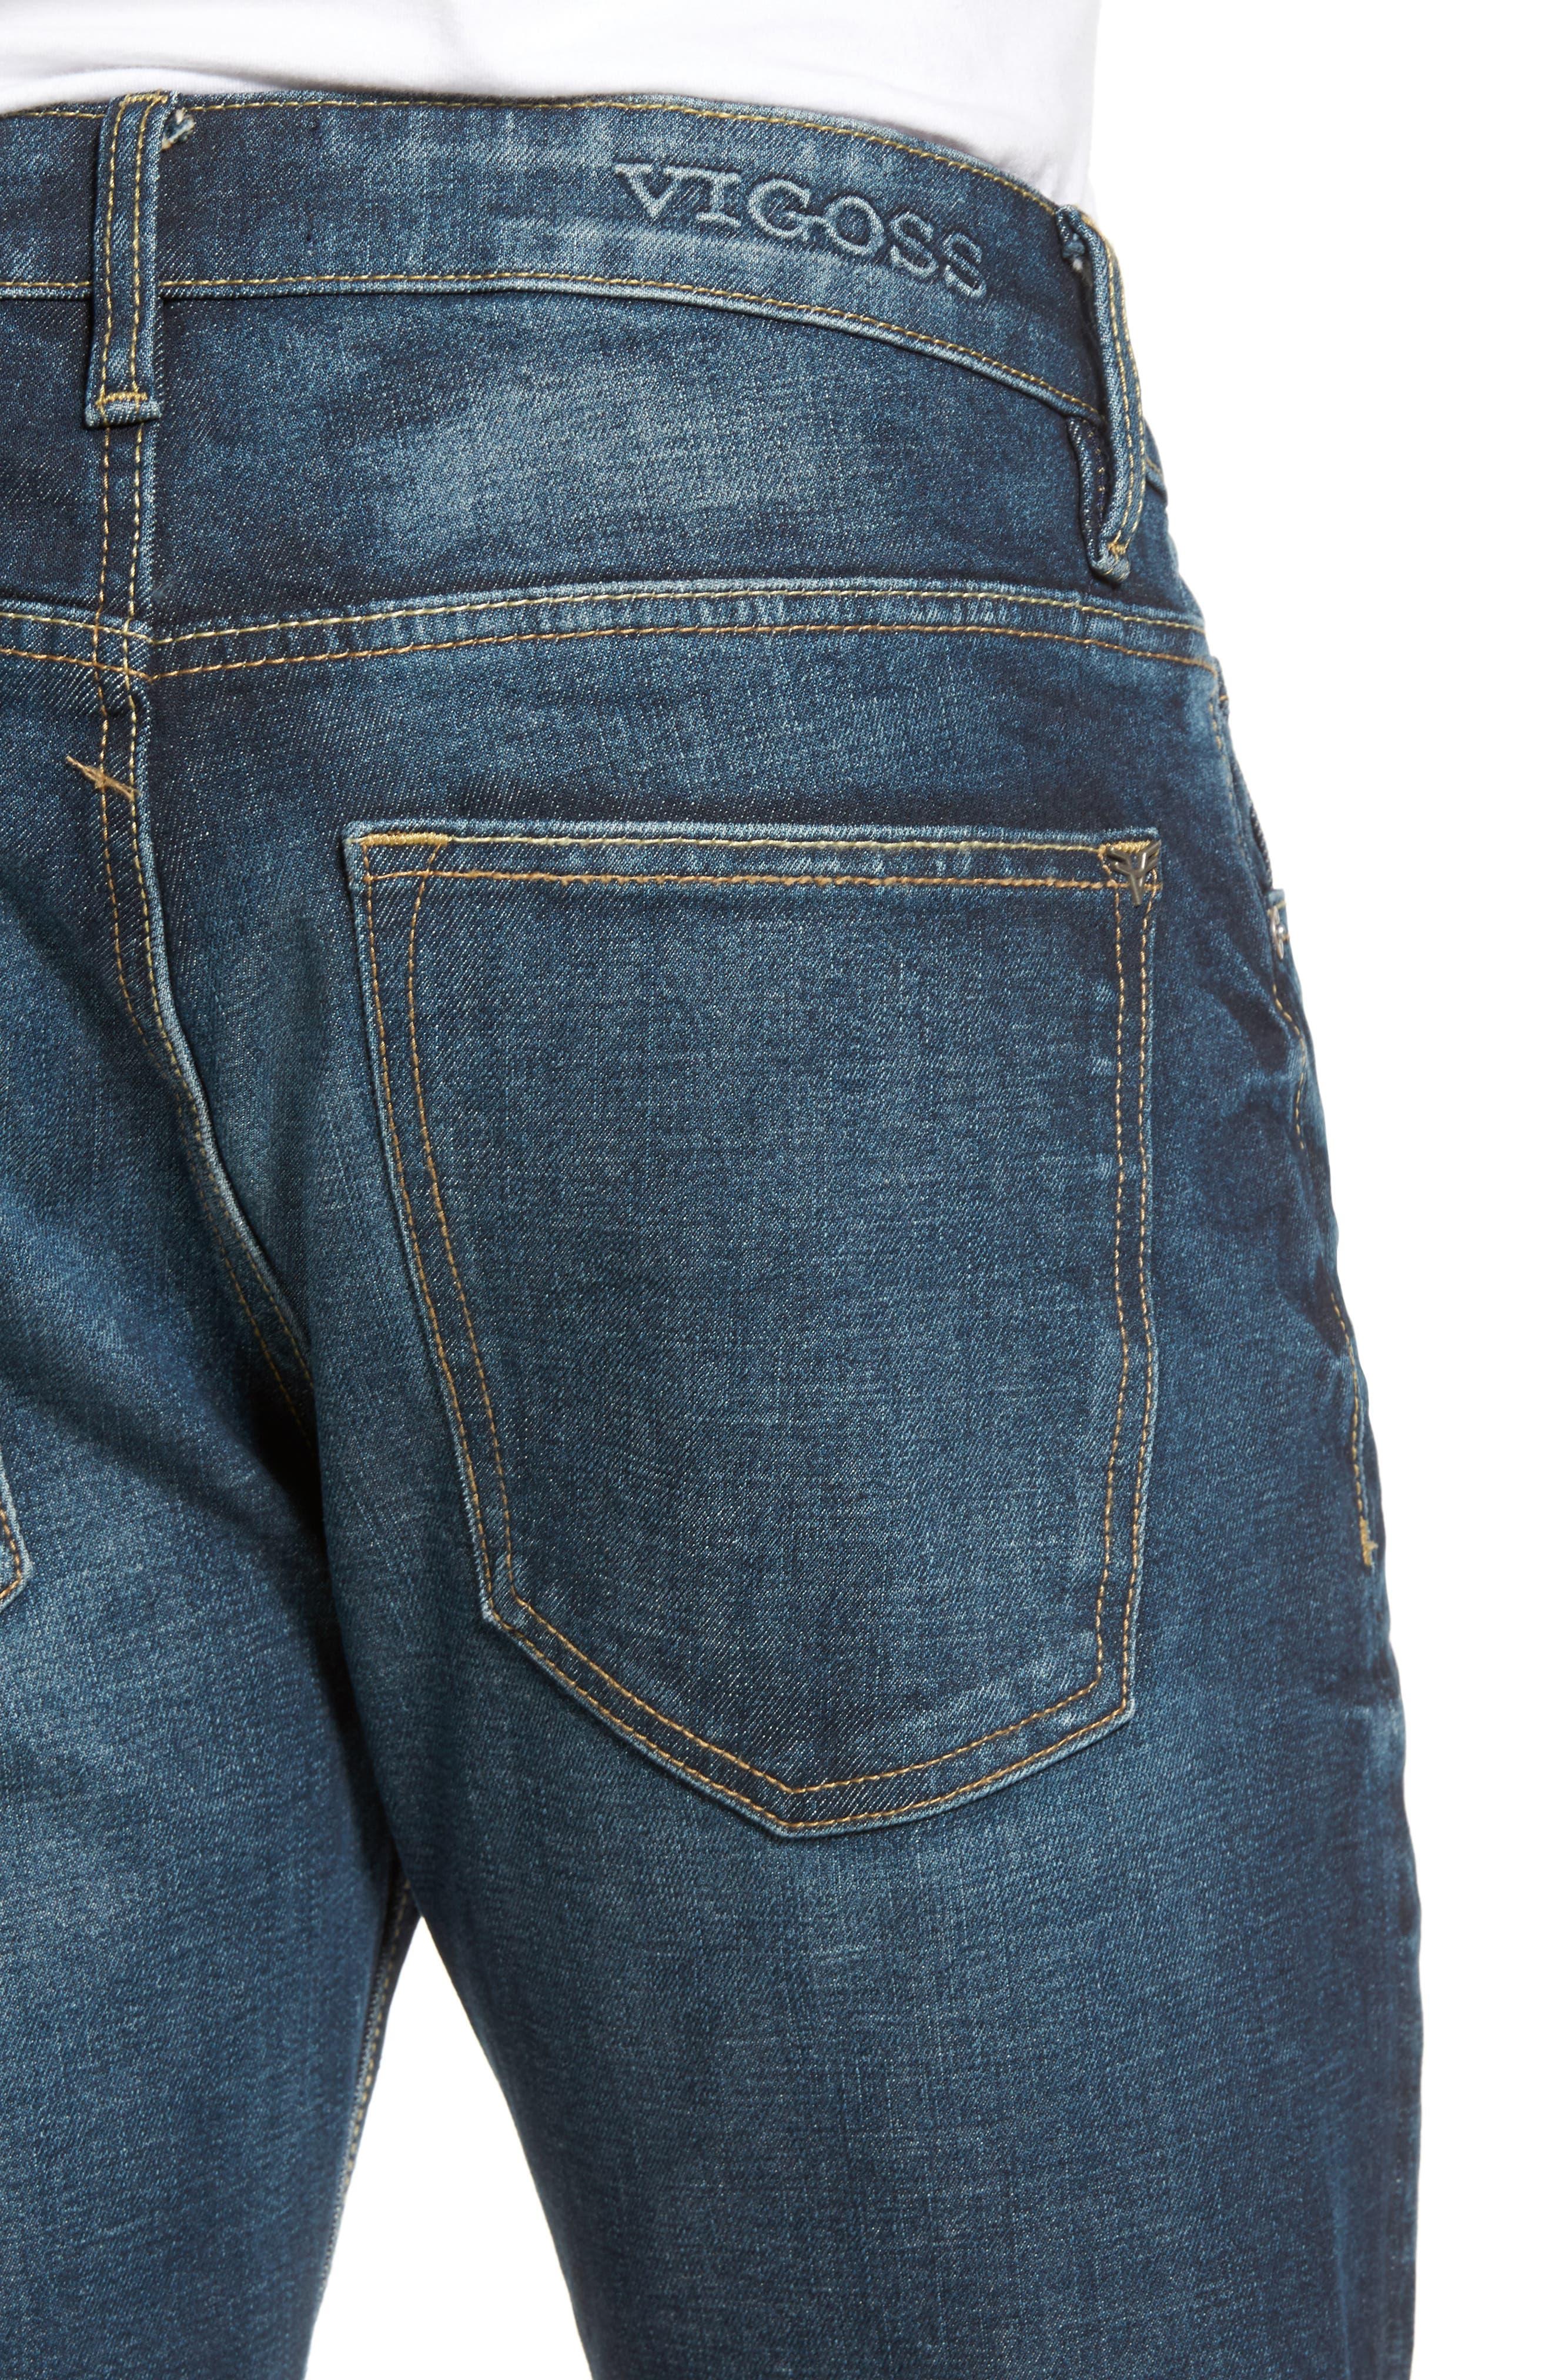 Slim Straight Leg Jeans,                             Alternate thumbnail 4, color,                             DARK WASH